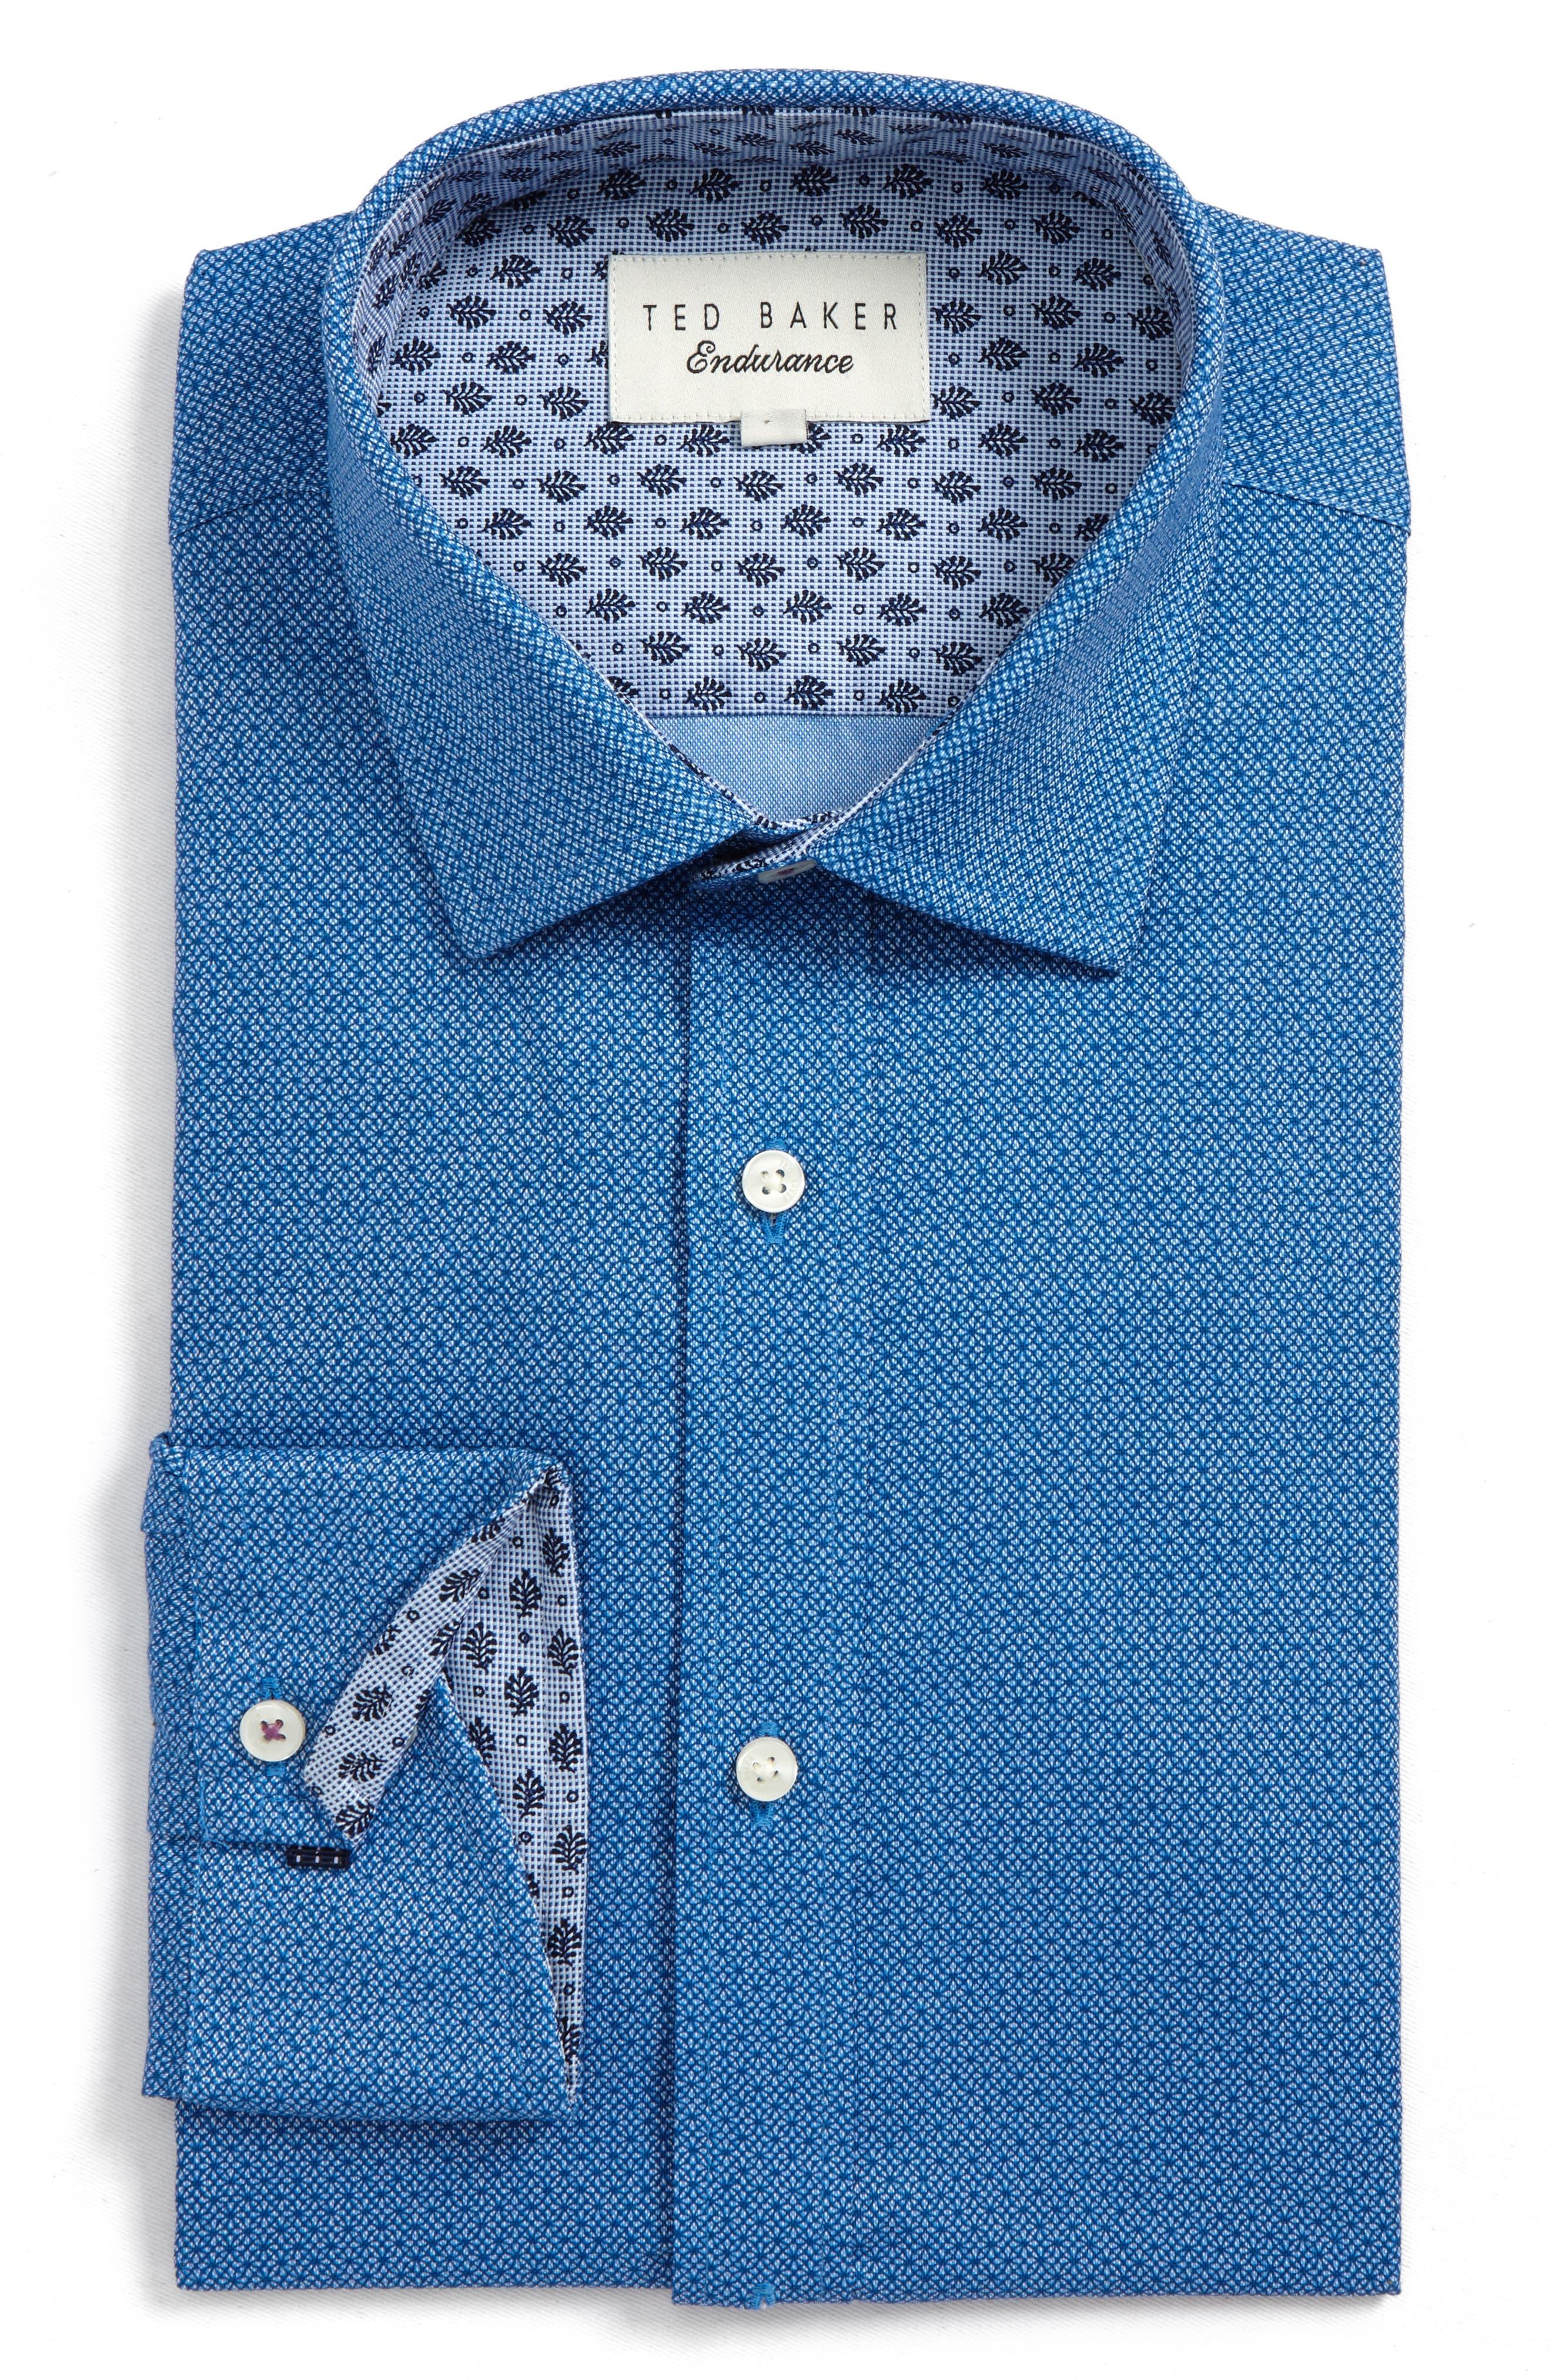 Endurance Murphy Trim Fit Dress Shirt,                             Main thumbnail 1, color,                             410